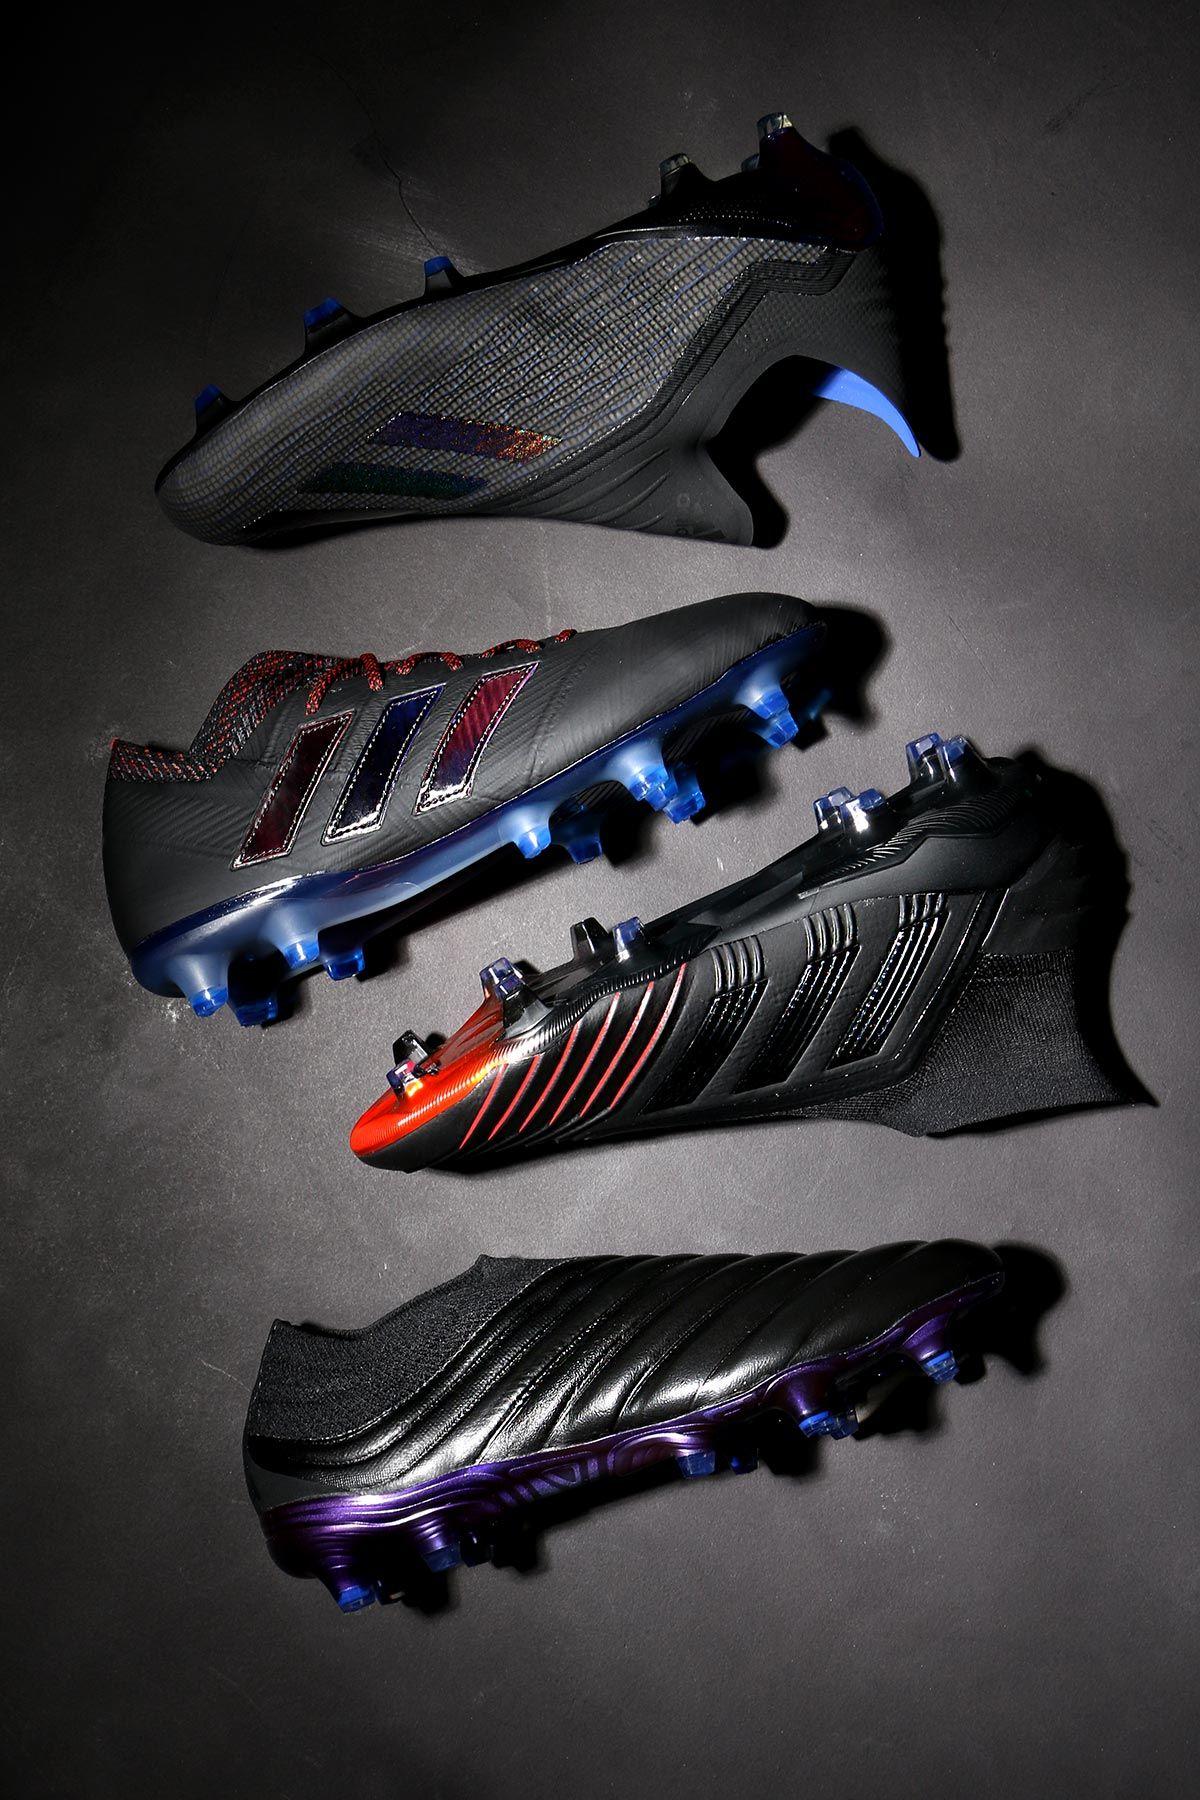 Adidas Archetic De XNemeziz 2019 Pack Botas Nuevas Fútbol zGSVLqUMp